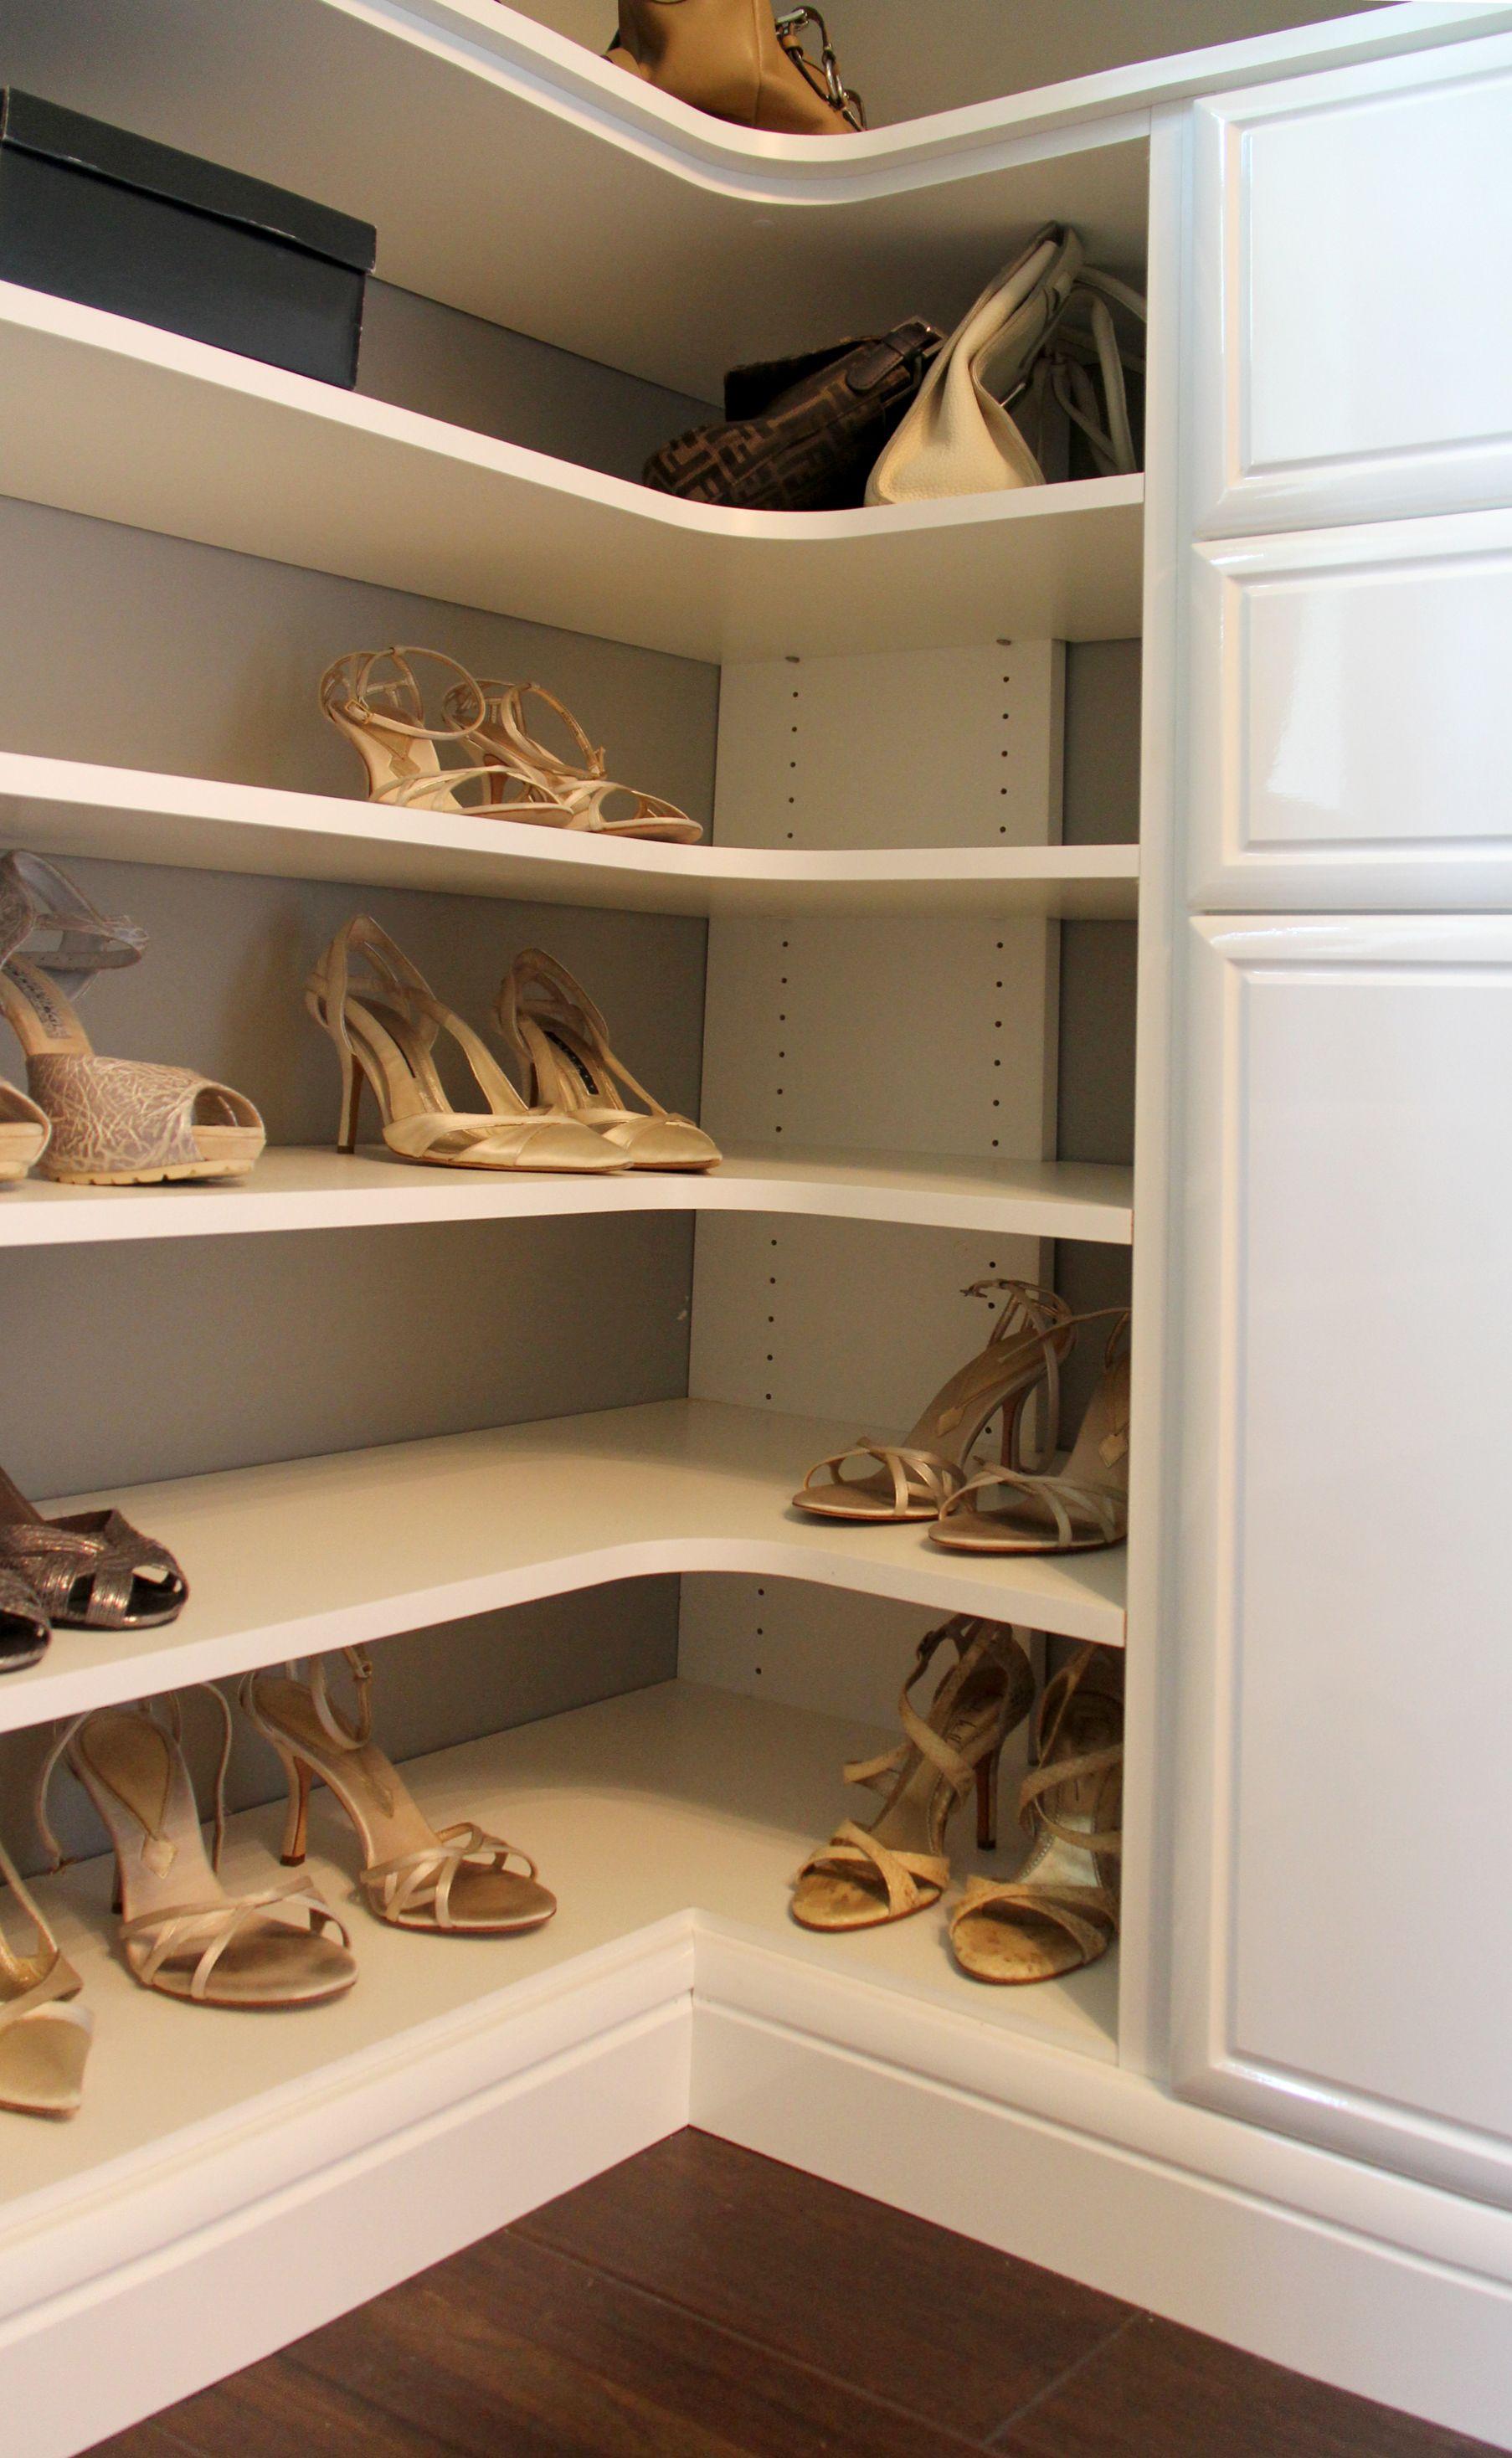 Practical Shoe Storage Odd Corner Under A Window No Problem Turn It Into A Fashionable Display Of Your Be Custom Closet Design Closet Designs Closet Design